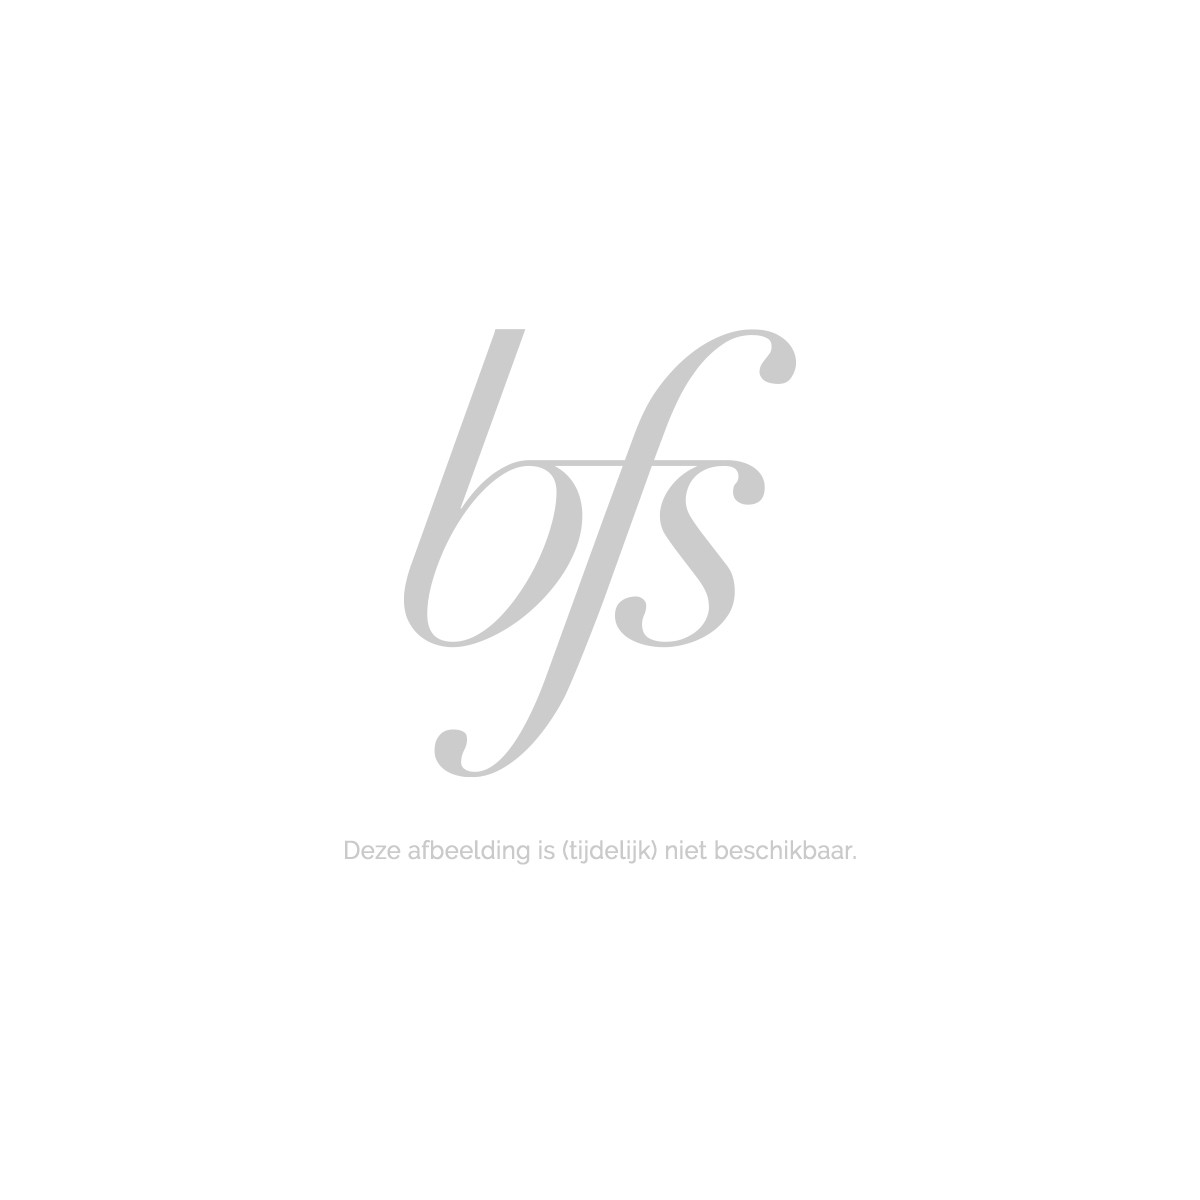 Estee Lauder Daywear Adv. Multi Perf. Anti-Oxidant 30 Ml